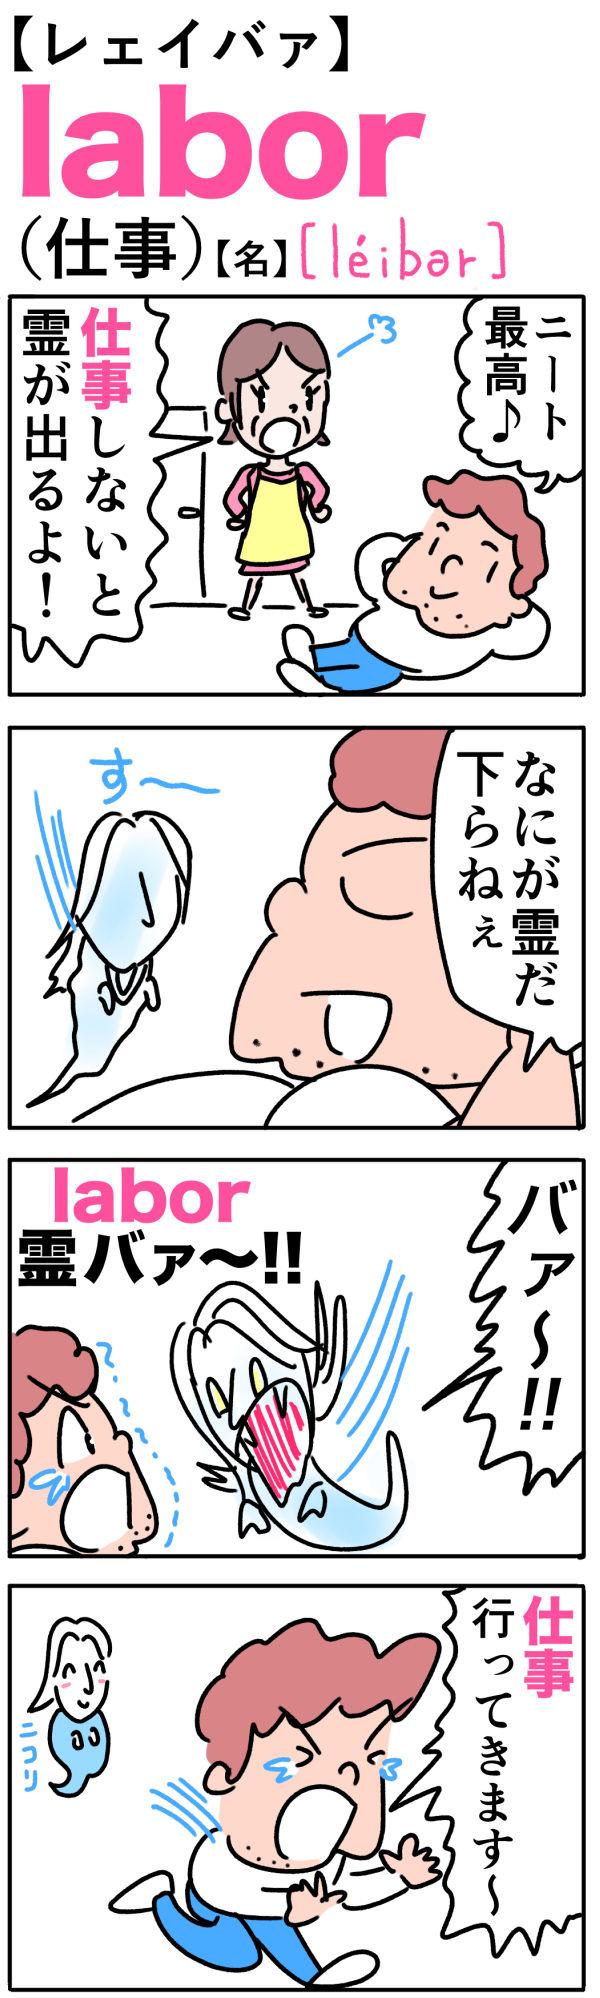 labor(仕事)の語呂合わせ英単語